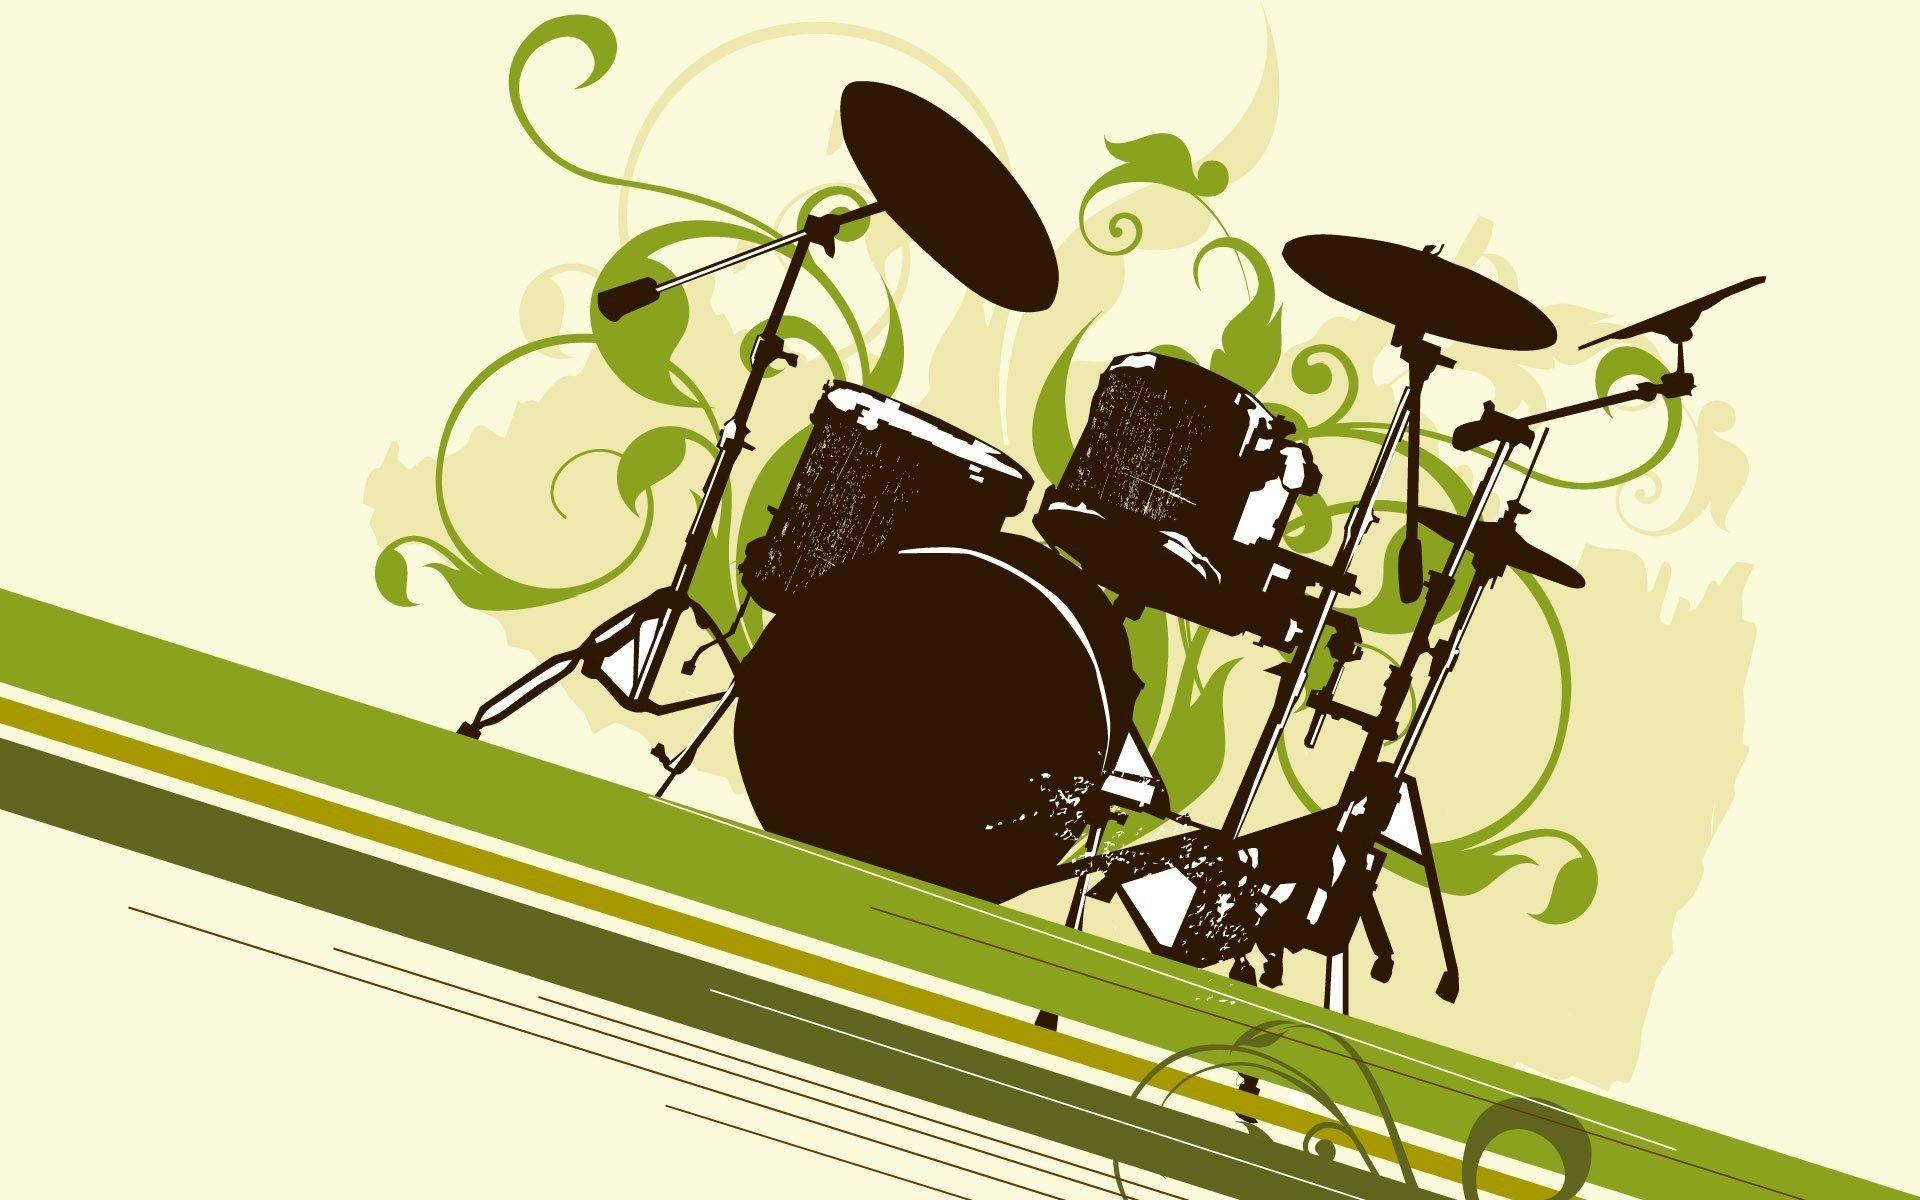 drum set wallpaper hd | ololoshenka | Pinterest | Drum sets